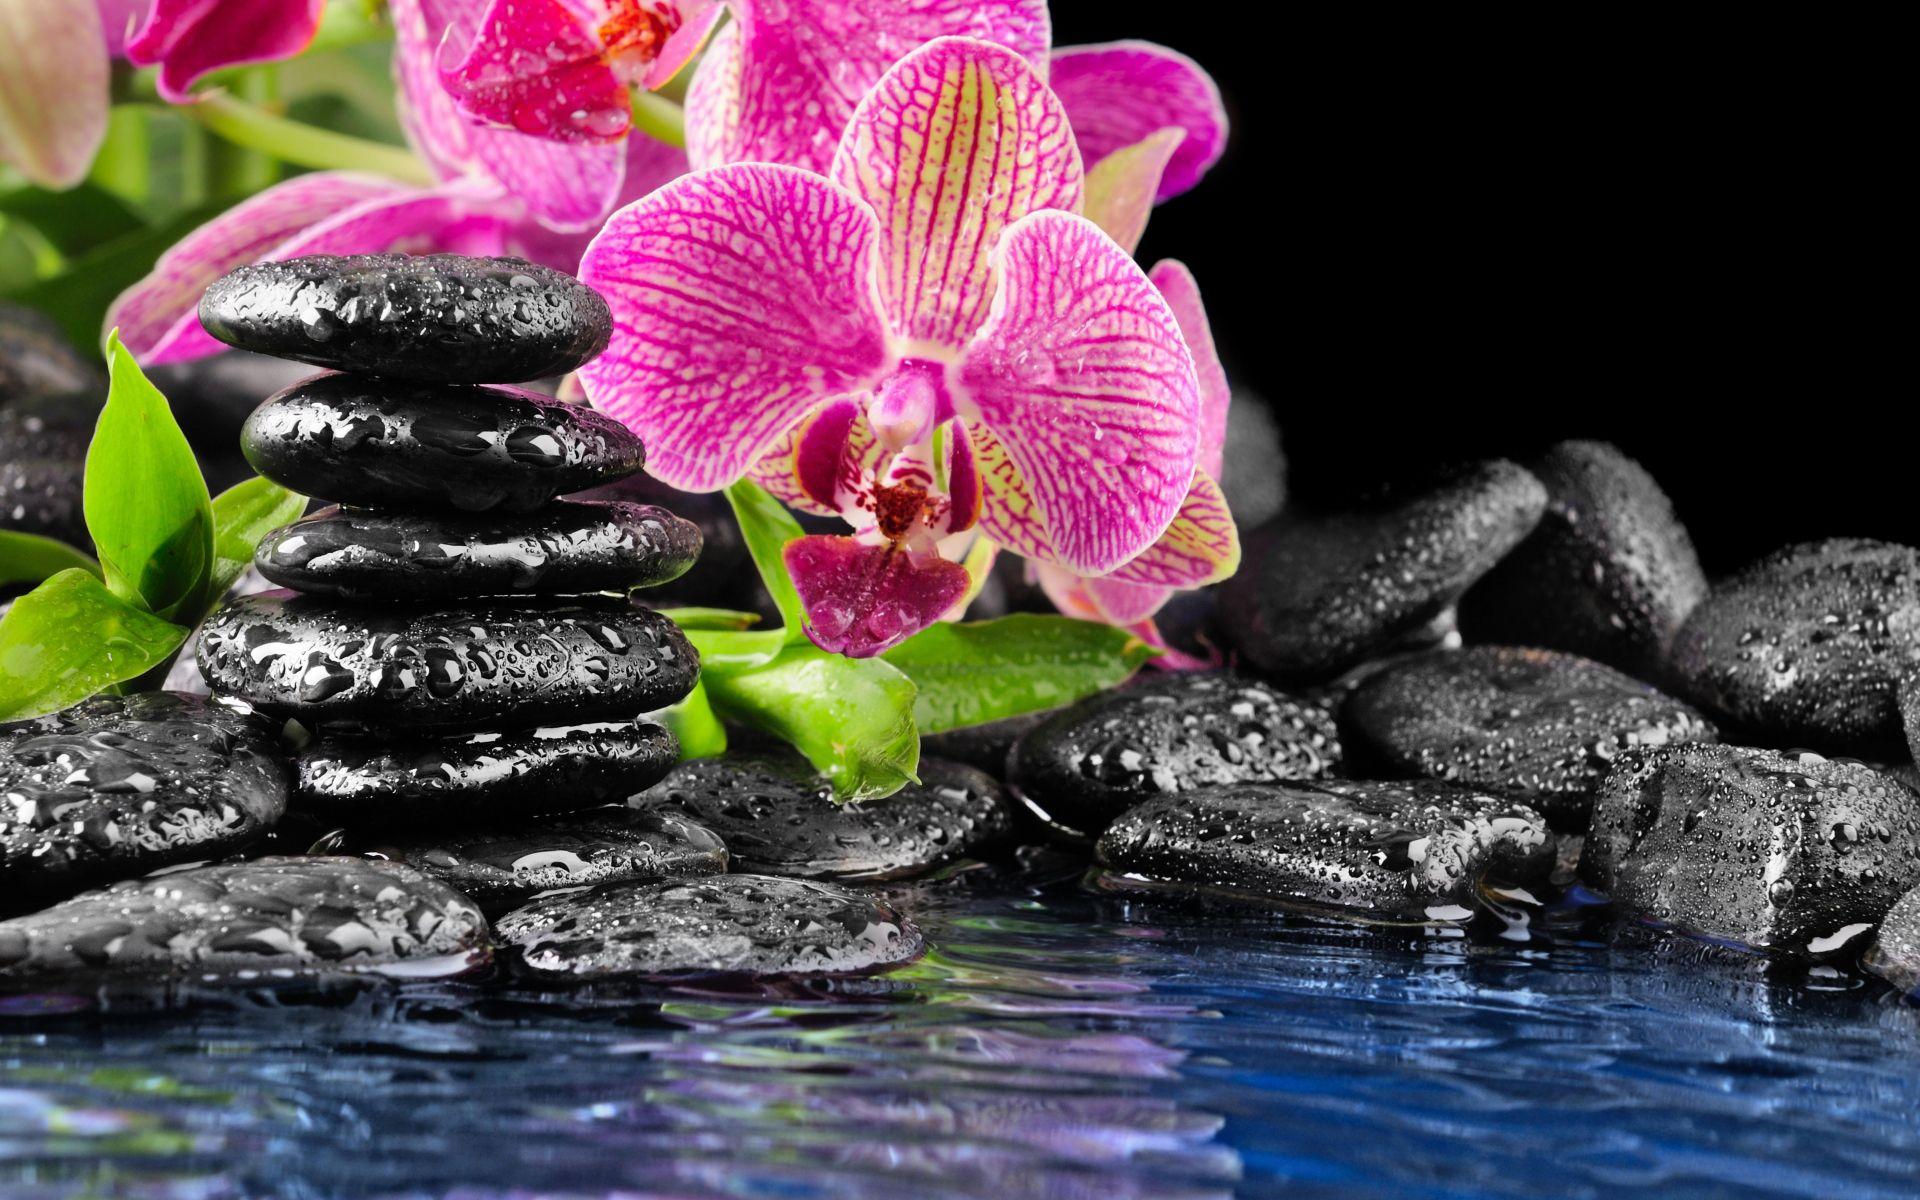 religieux zen fond d 39 cran zen attitude pinterest religieuse zen et cran. Black Bedroom Furniture Sets. Home Design Ideas